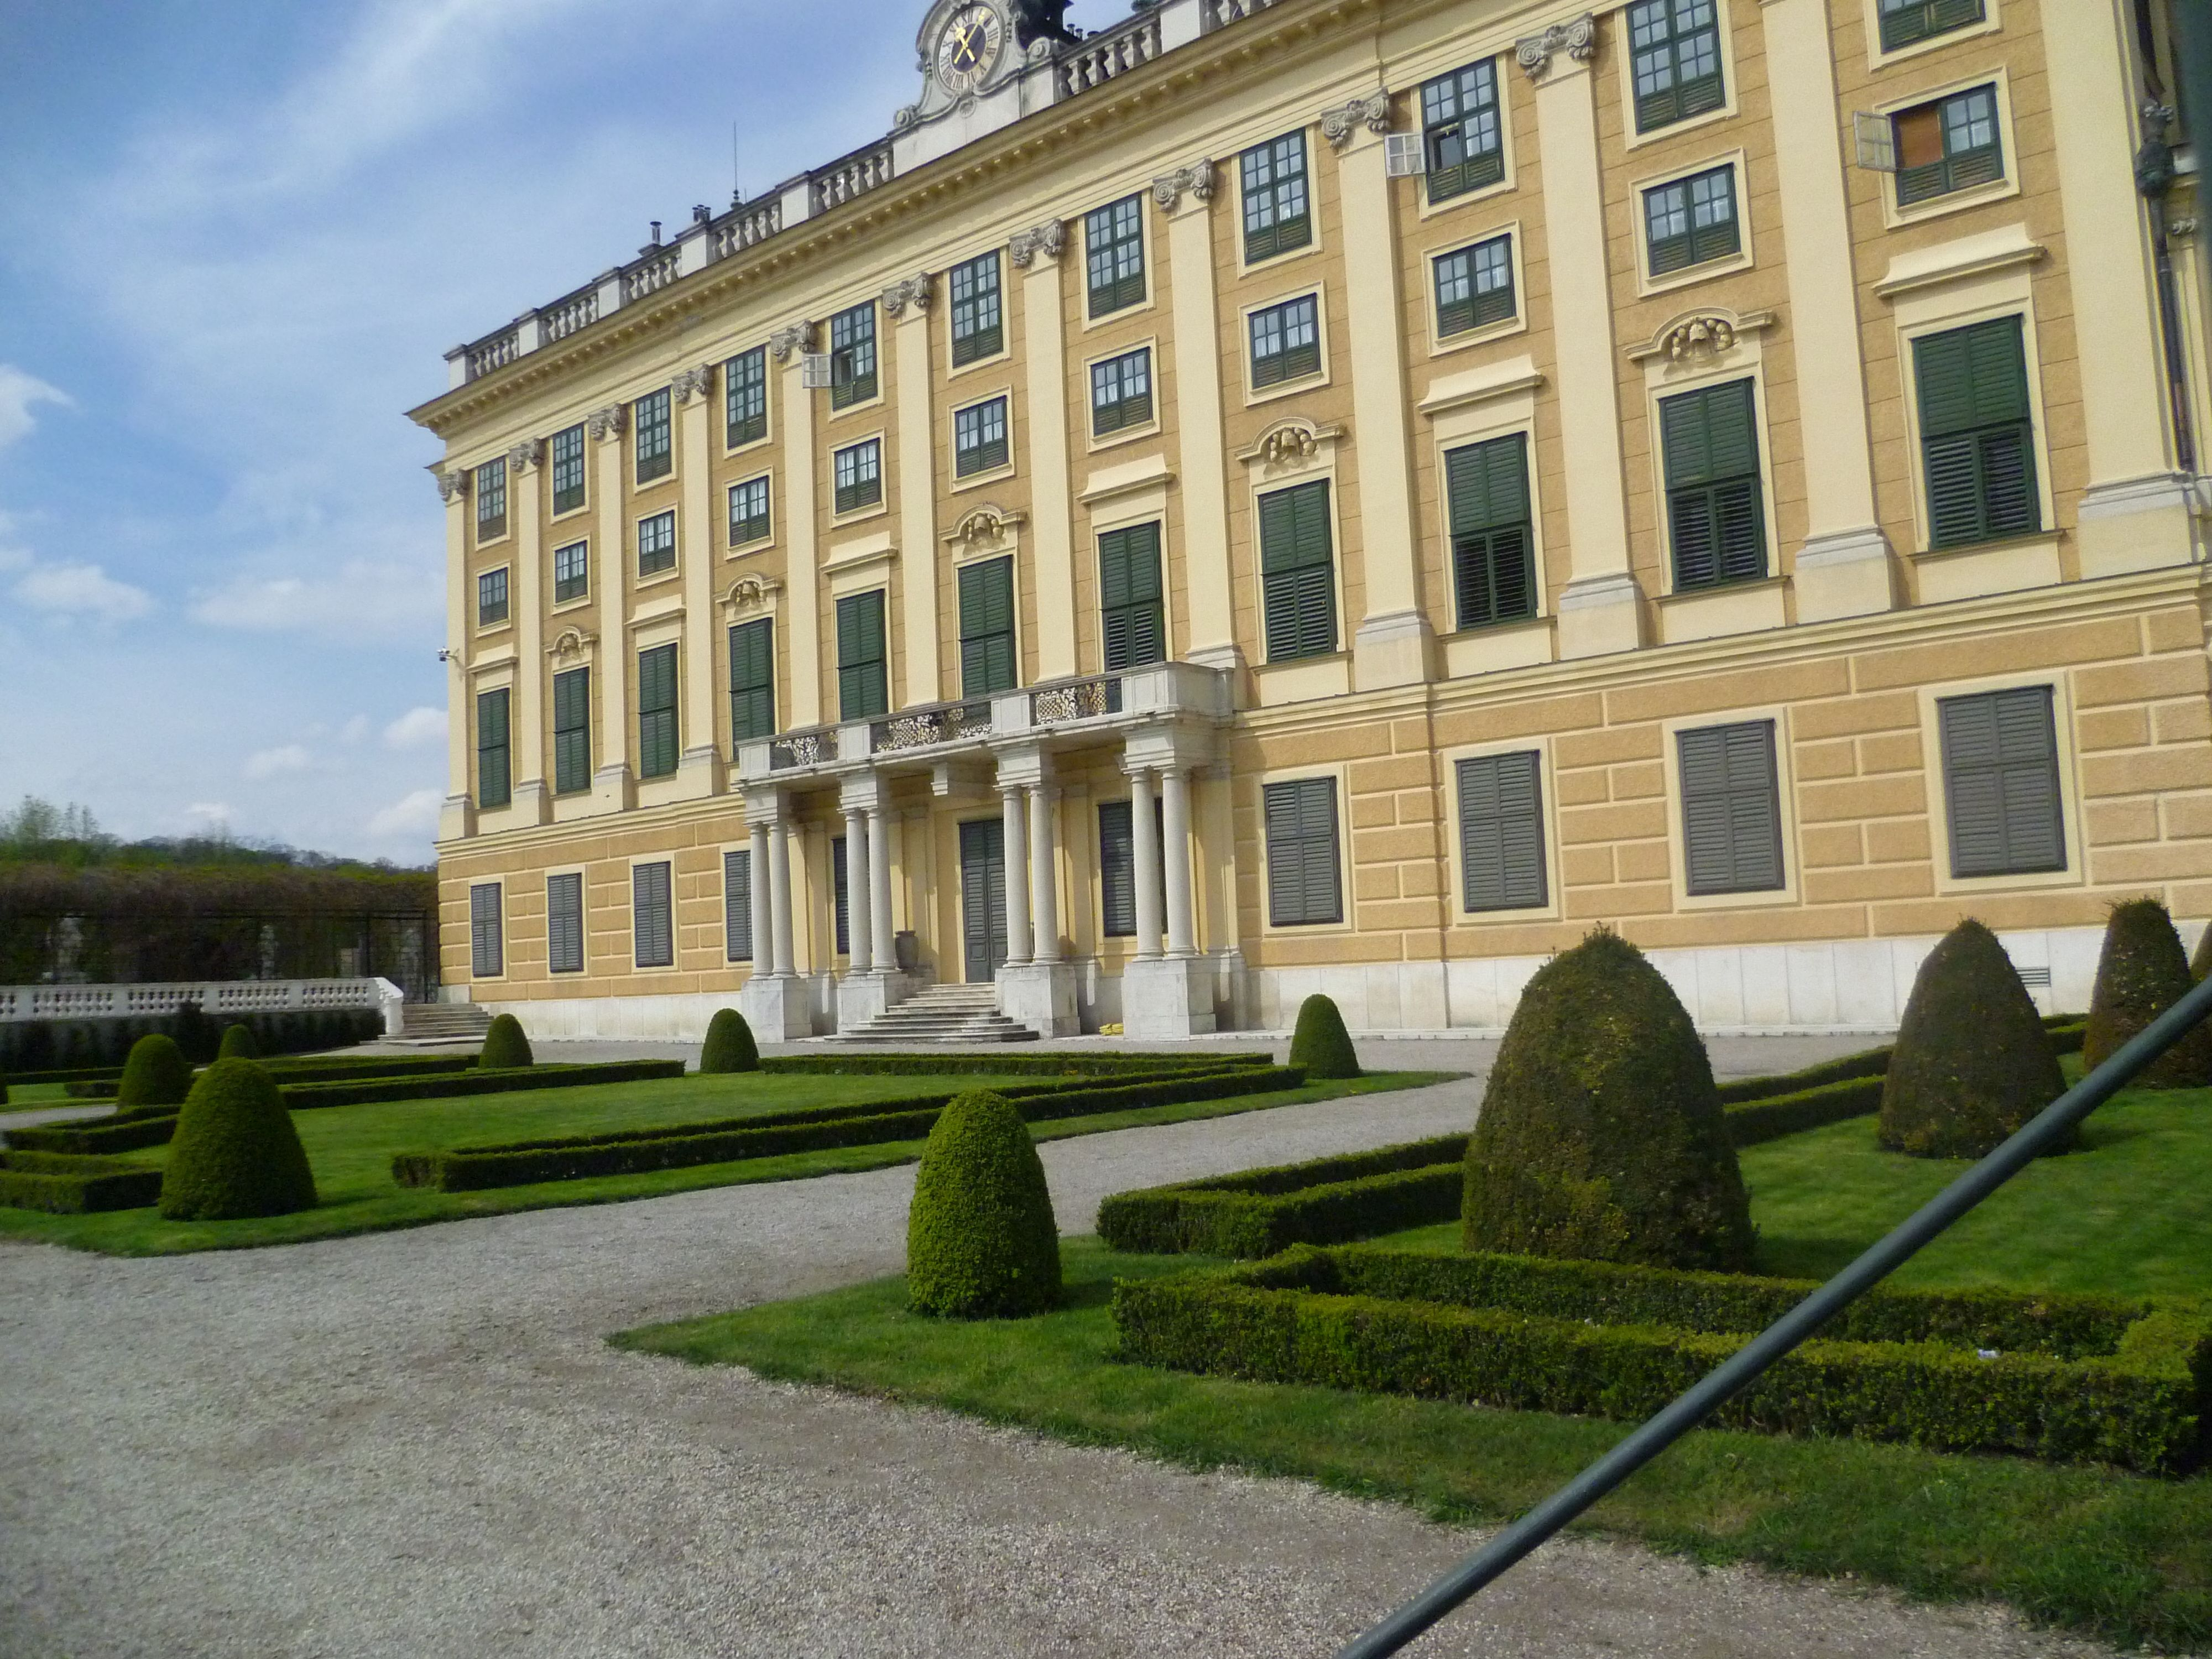 Schloss Schonbrun Schloss Schonbrunn Schloss Schonbrunn